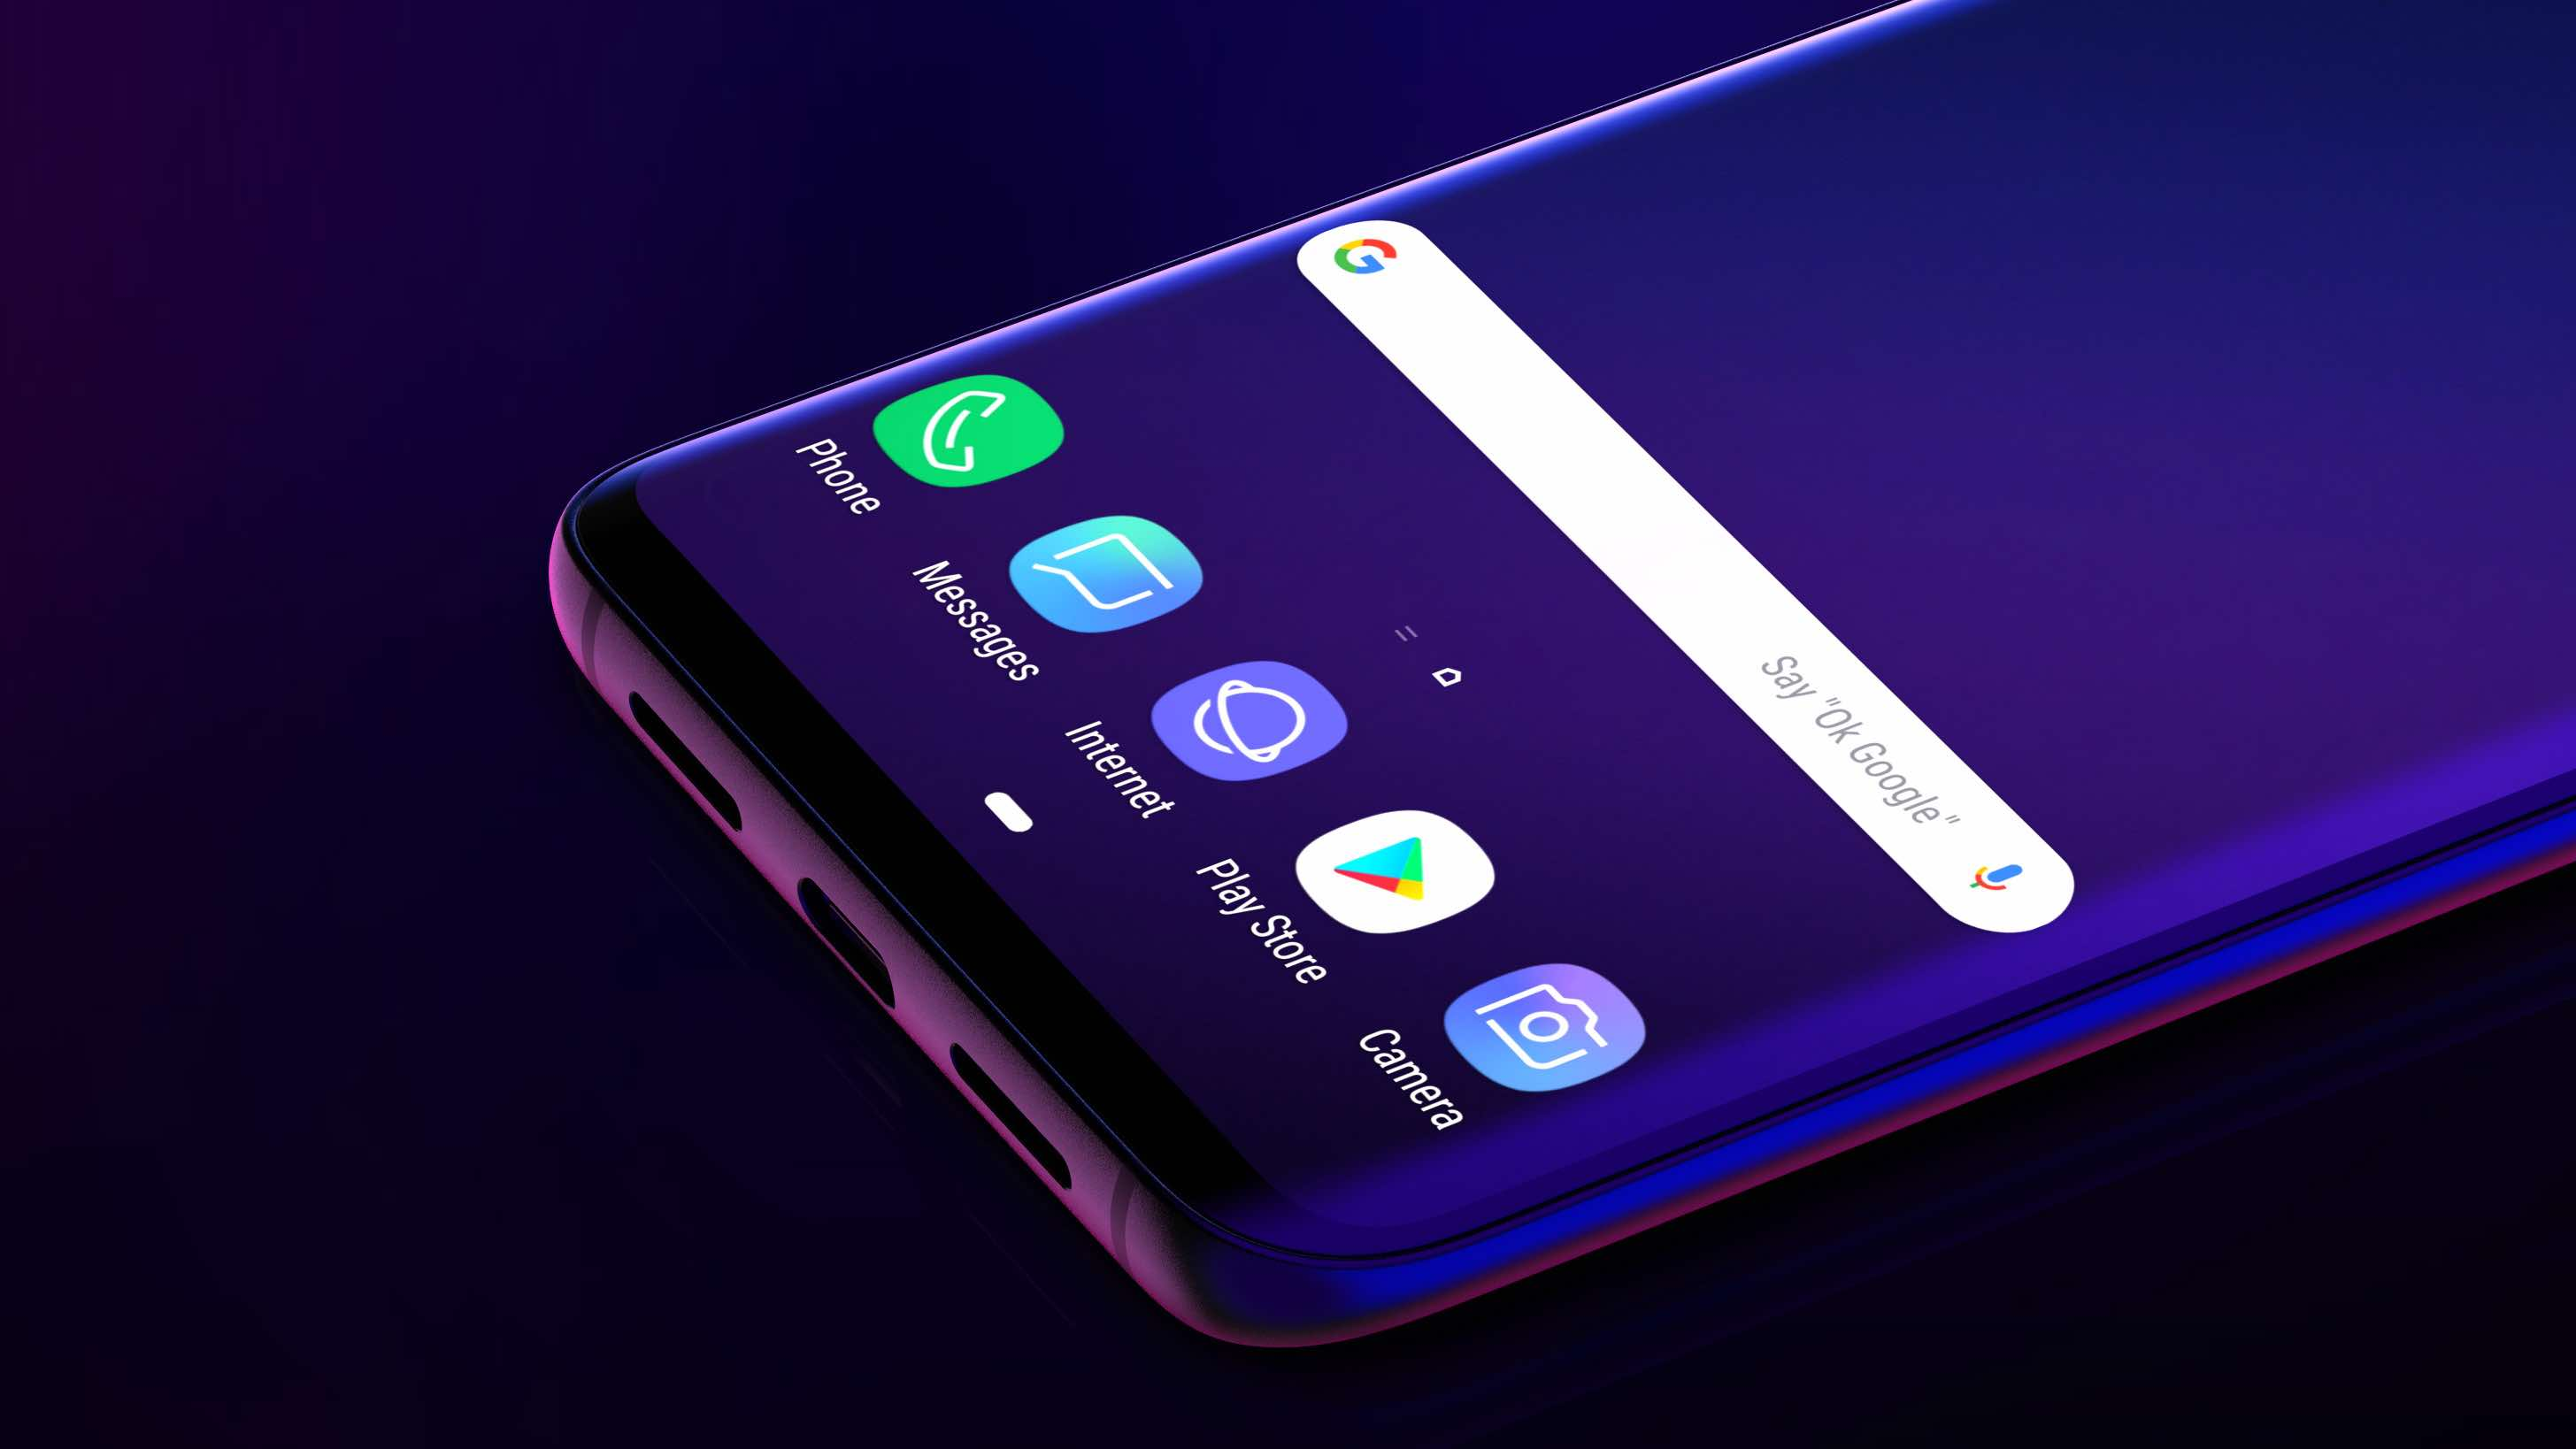 Samsung Galaxy S10 concept 5